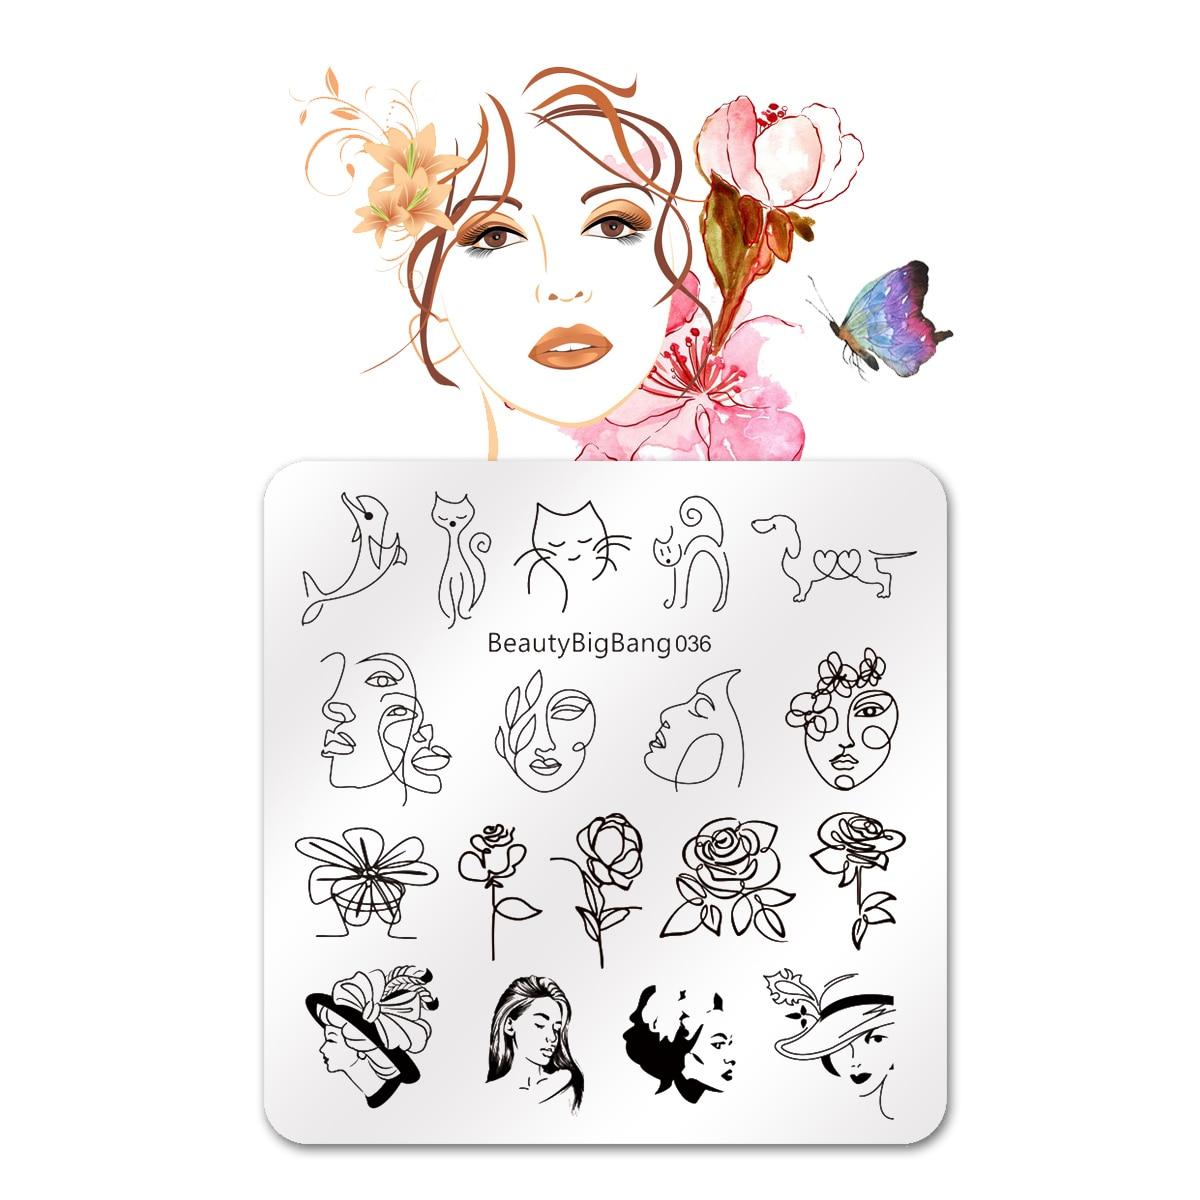 BEAUTYBIGBANG 6*6cm Square Flower Girl Animal Pattern Nail Stamping Plate Nail TemplateNail Art Stamp Image Template